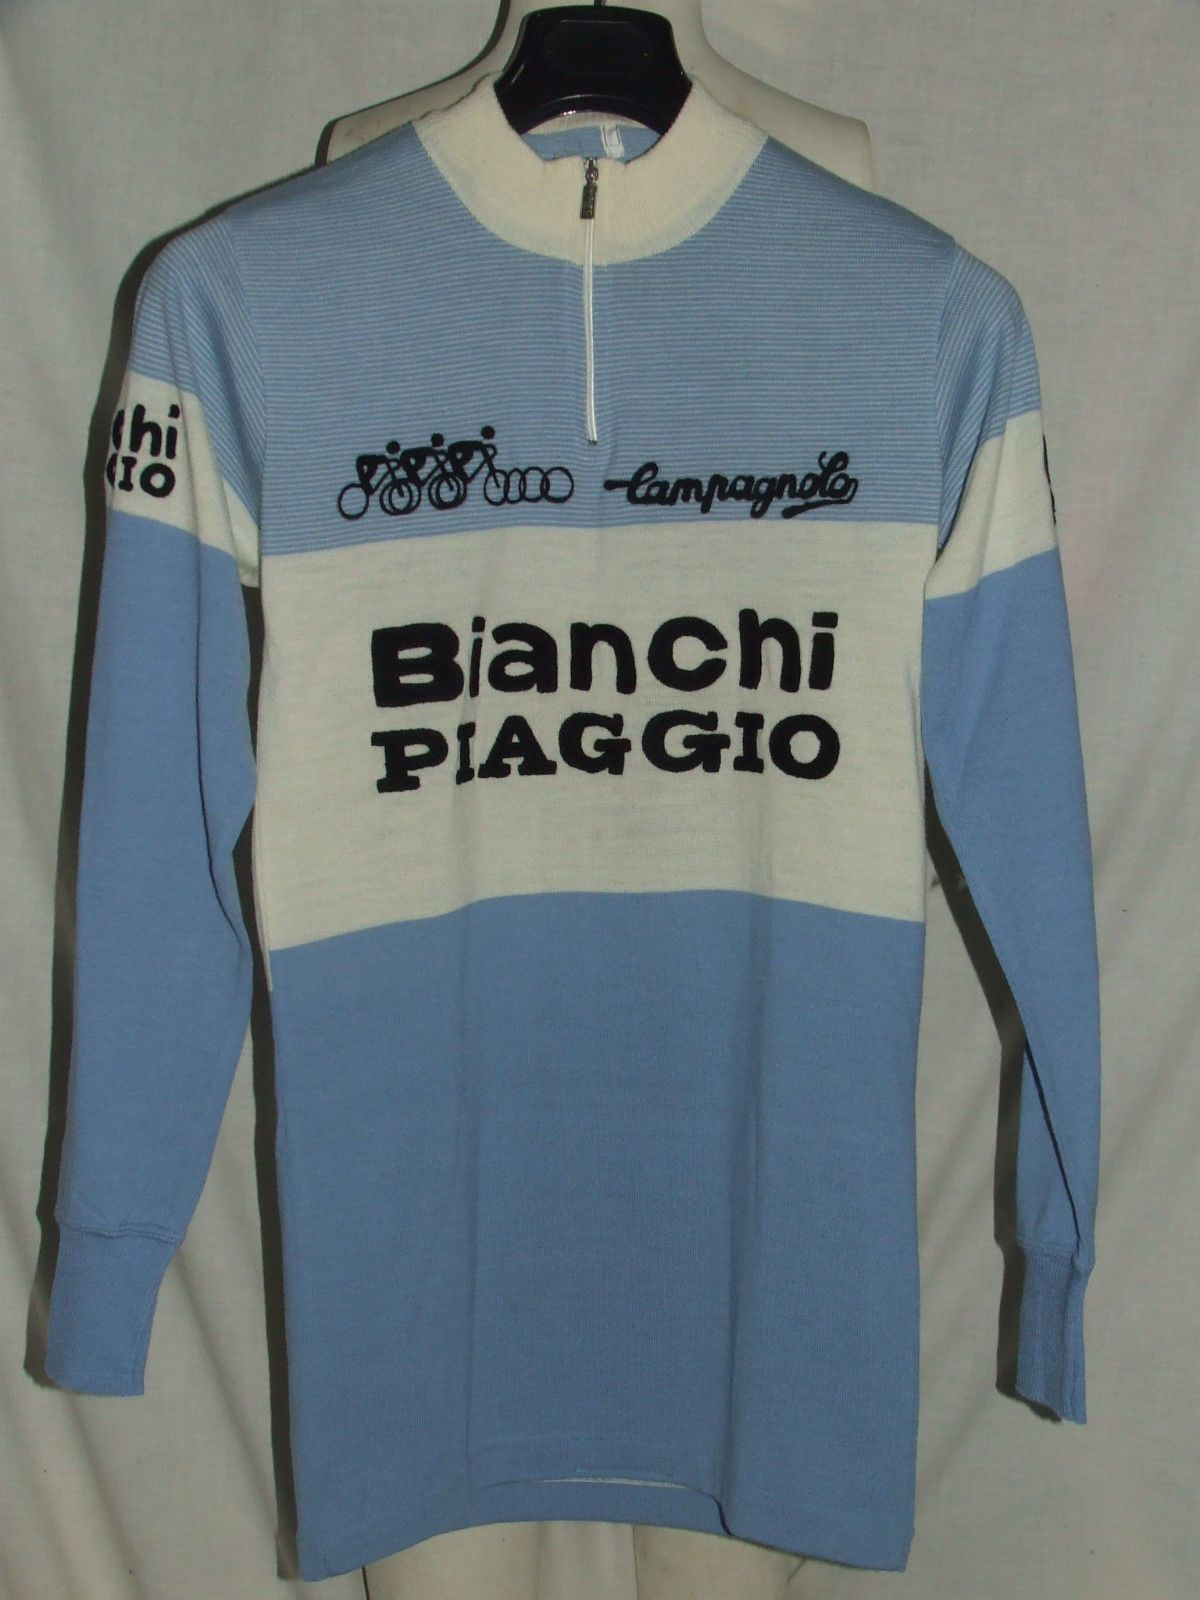 Maglia Bici Shirt Maillot Ciclismo Vintage 70 S Bianchi Piaggio Lana Ricamata Ebay Bike Jersey Cycling Shirt Long Sleeve Tshirt Men